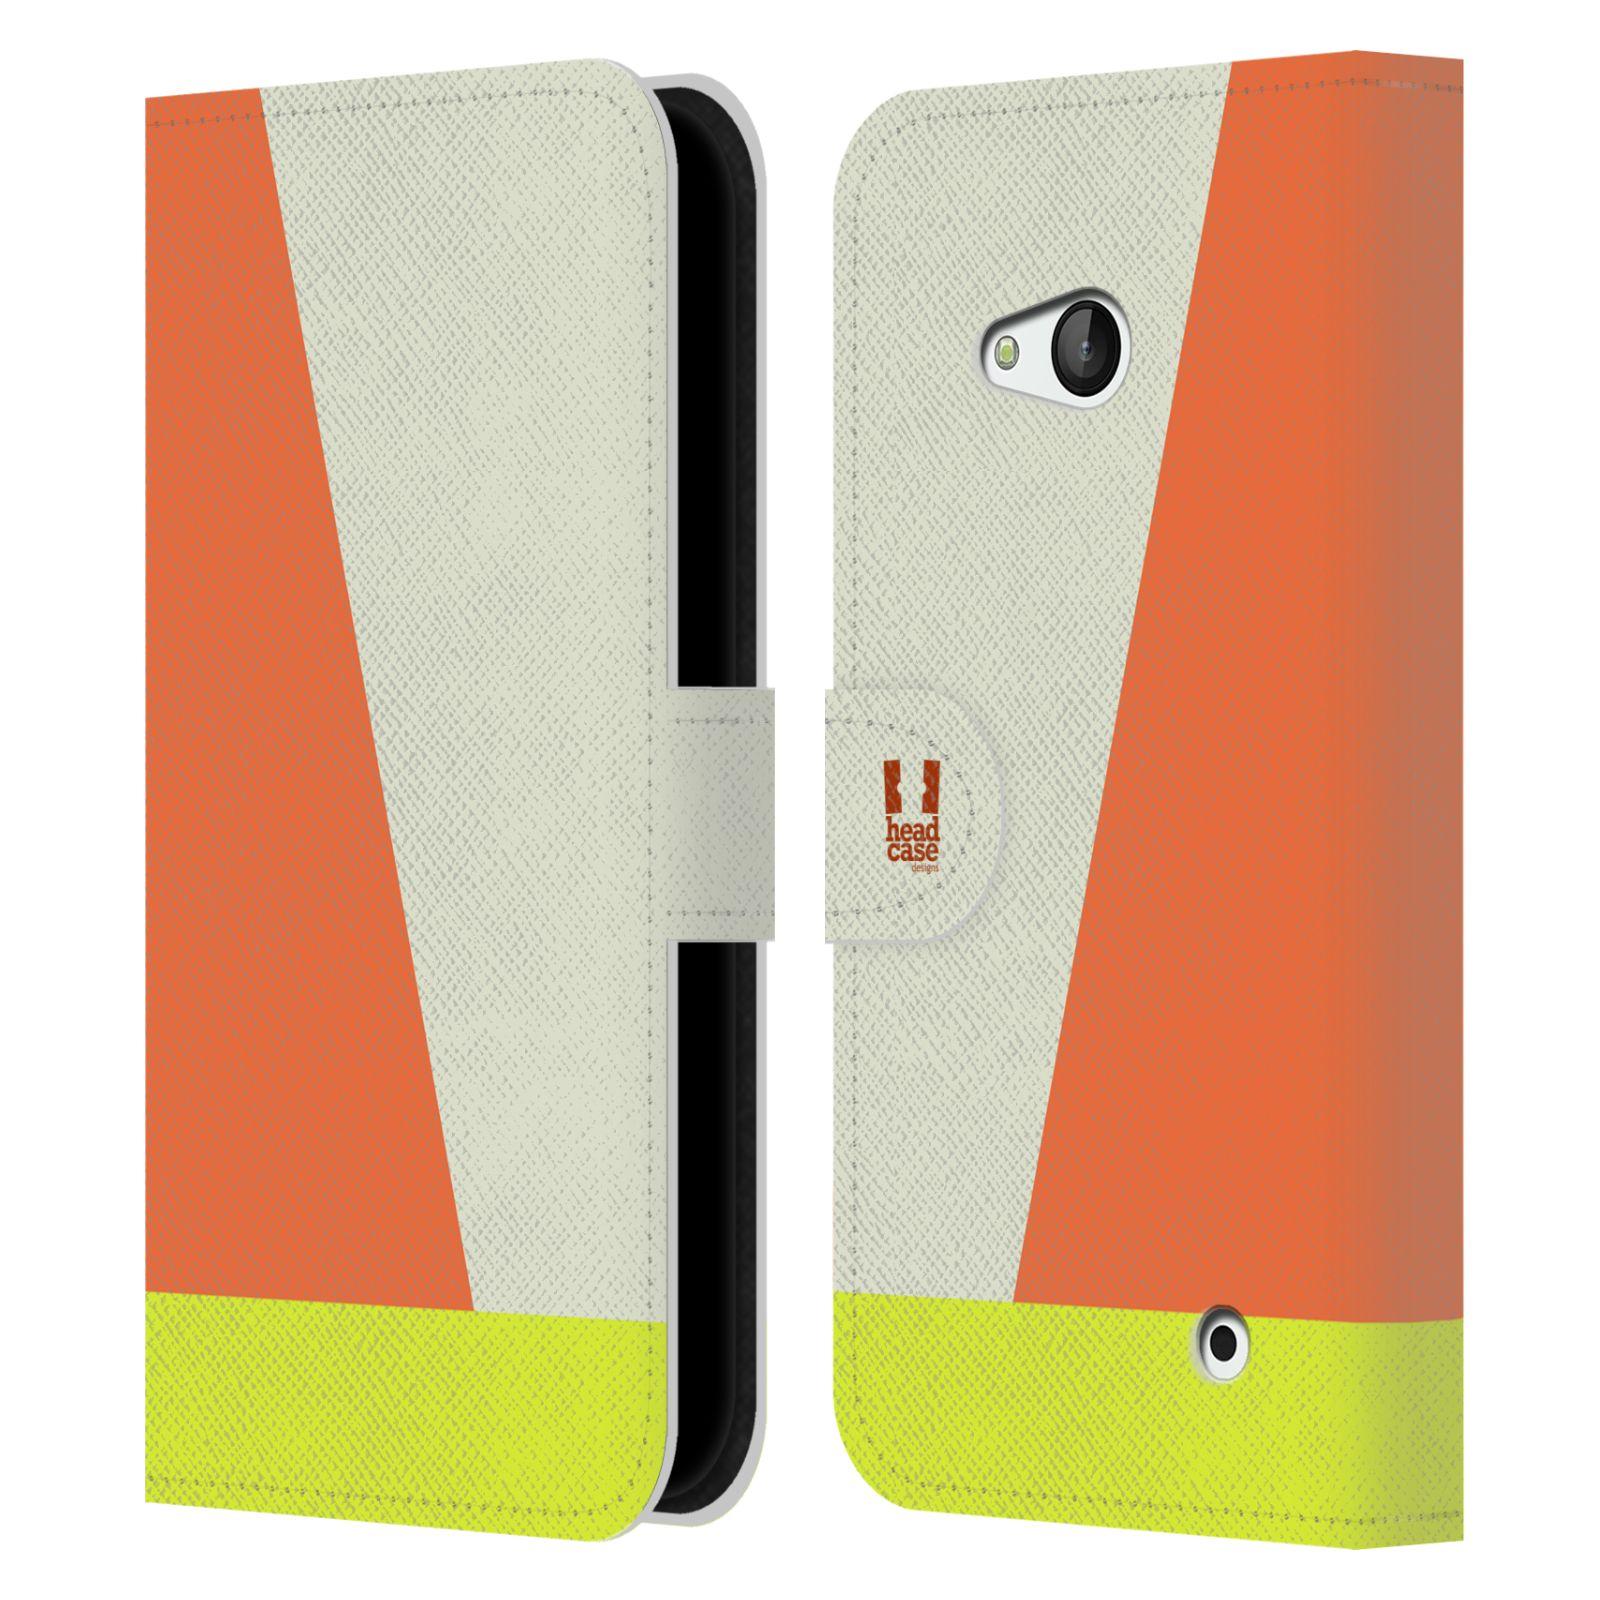 HEAD CASE Flipové pouzdro pro mobil Nokia LUMIA 640 barevné tvary slonová kost